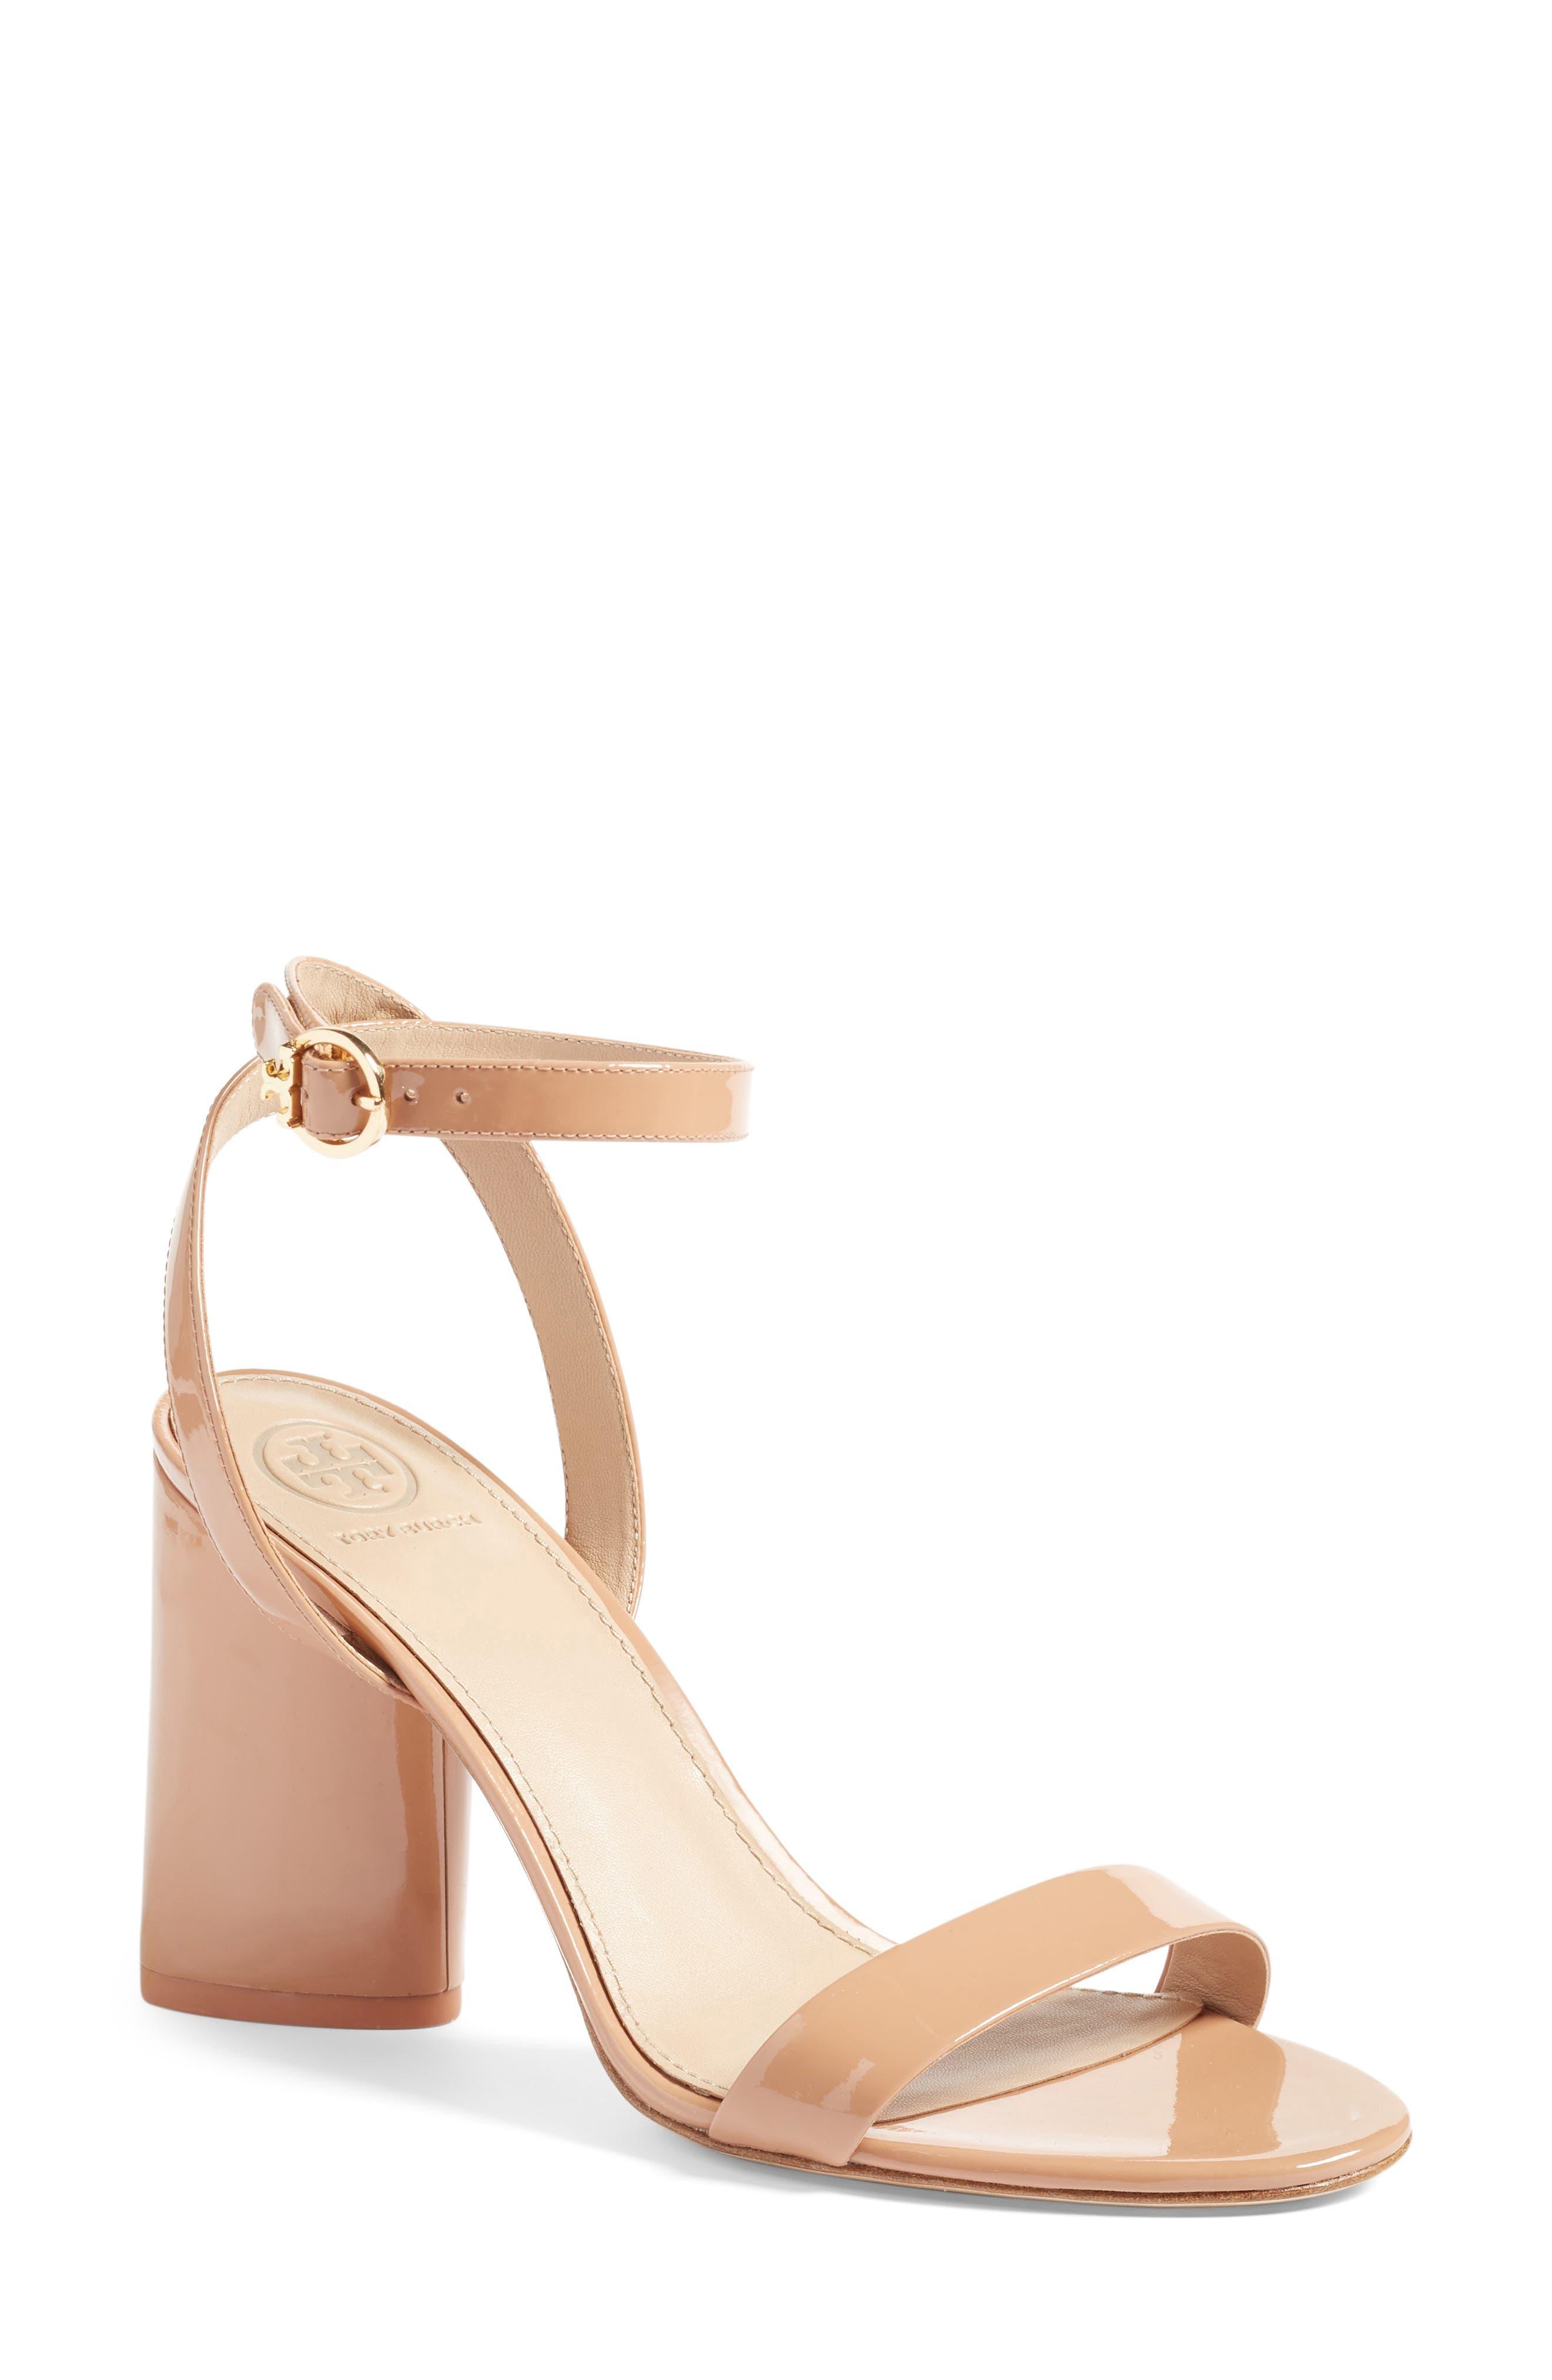 Alternate Image 1 Selected - Tory Burch Elizabeth Block Heel Sandal (Women)